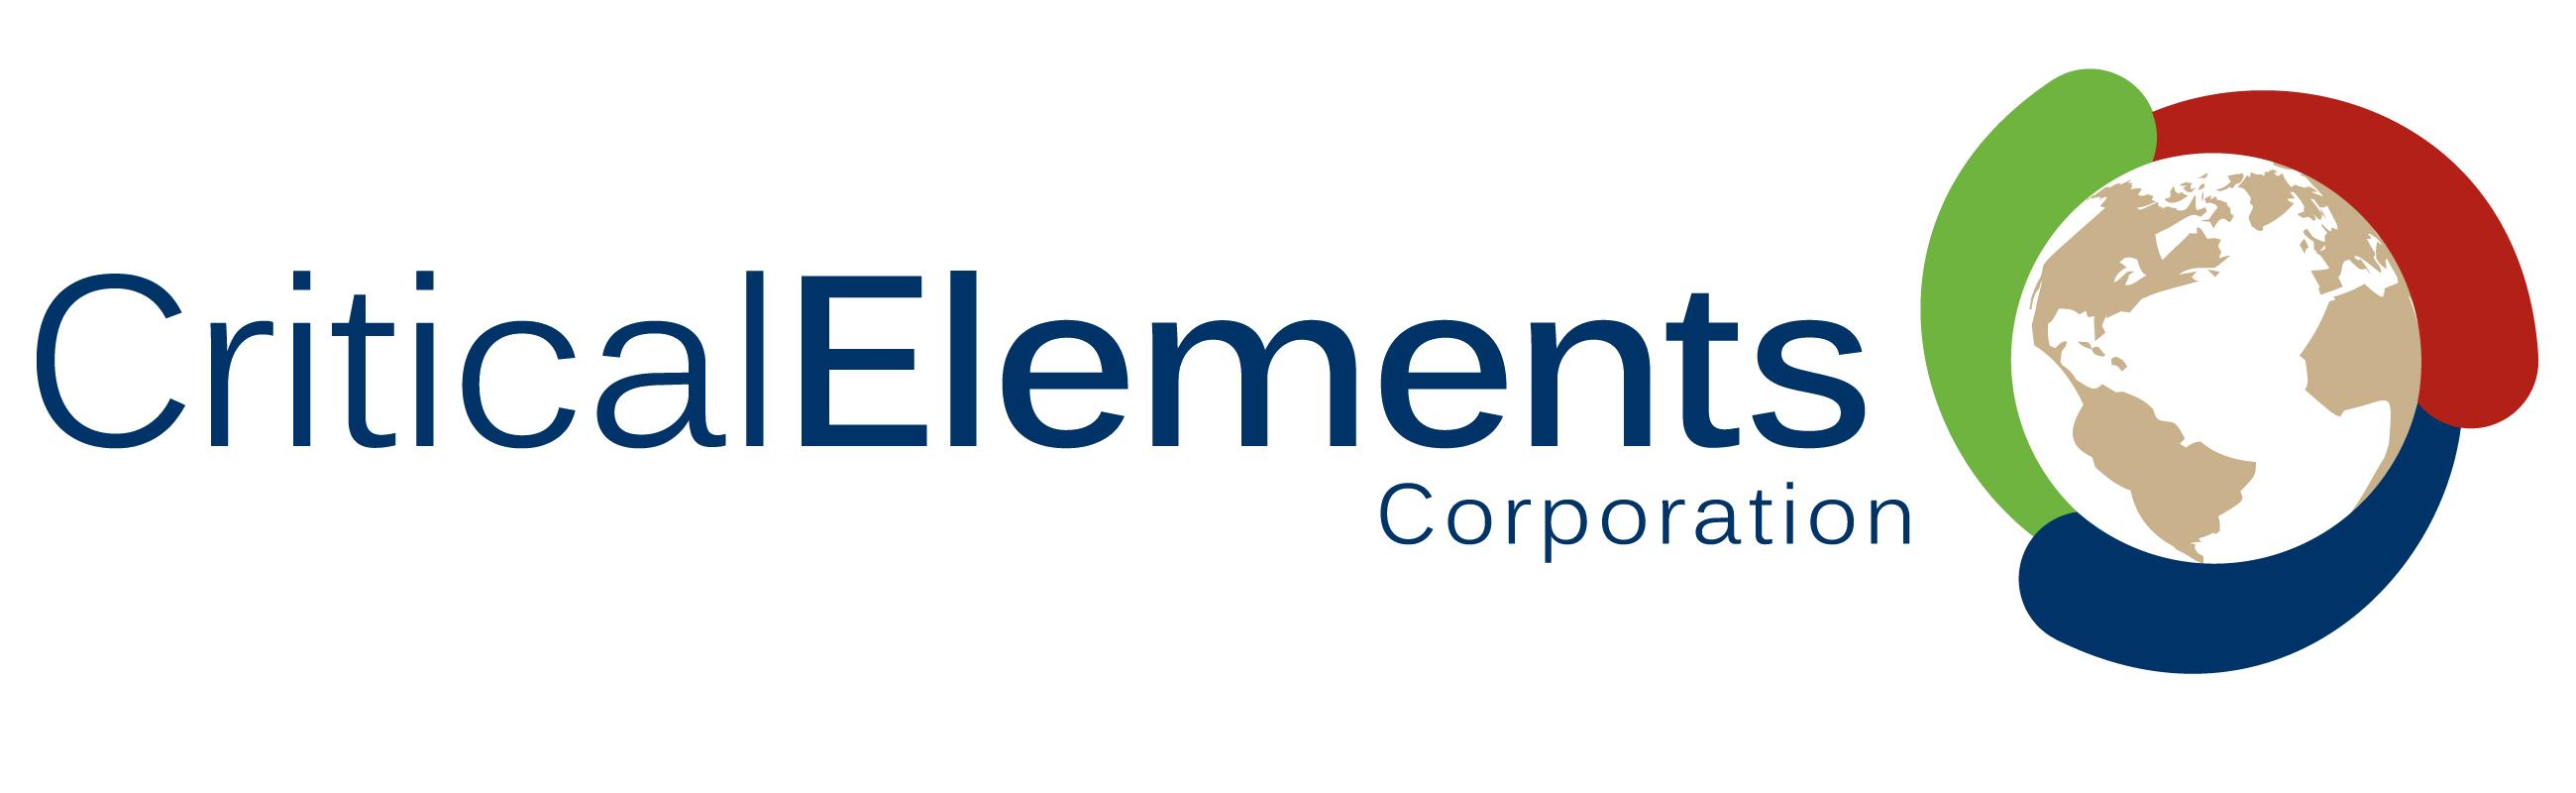 Critical Elements Lithium Corporation: Corporate Update